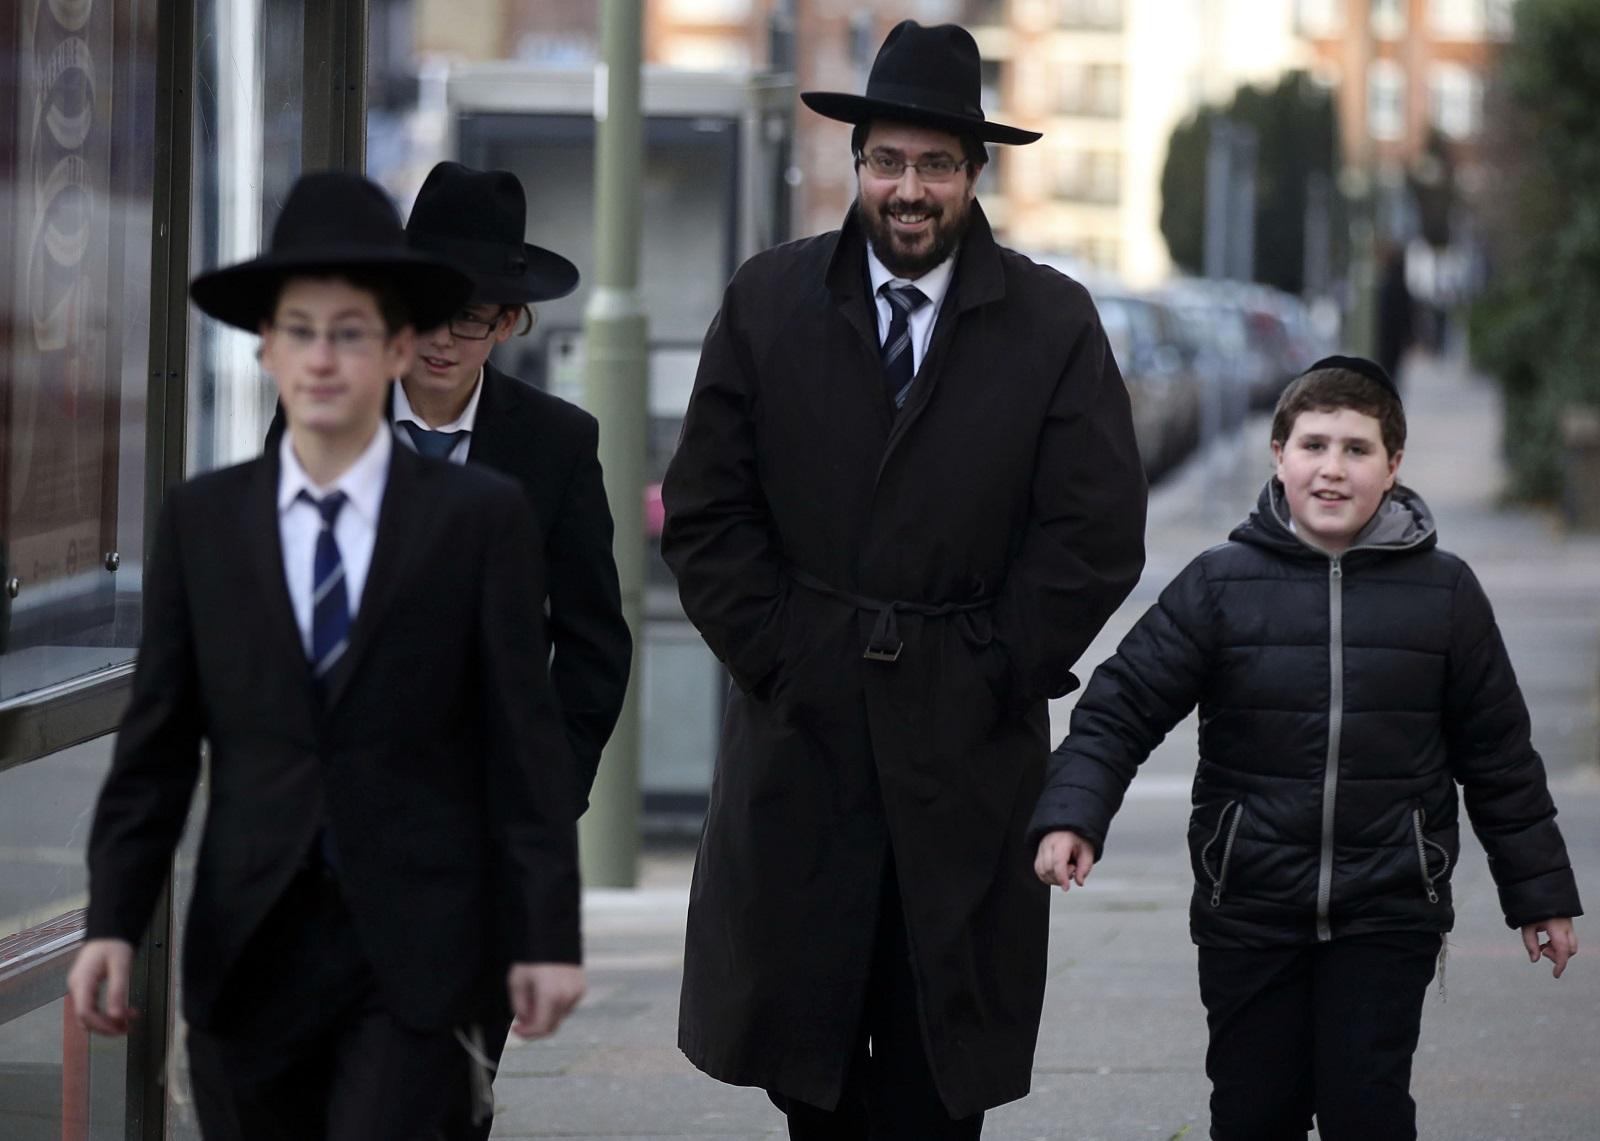 Jews in Golders Greeen face threat